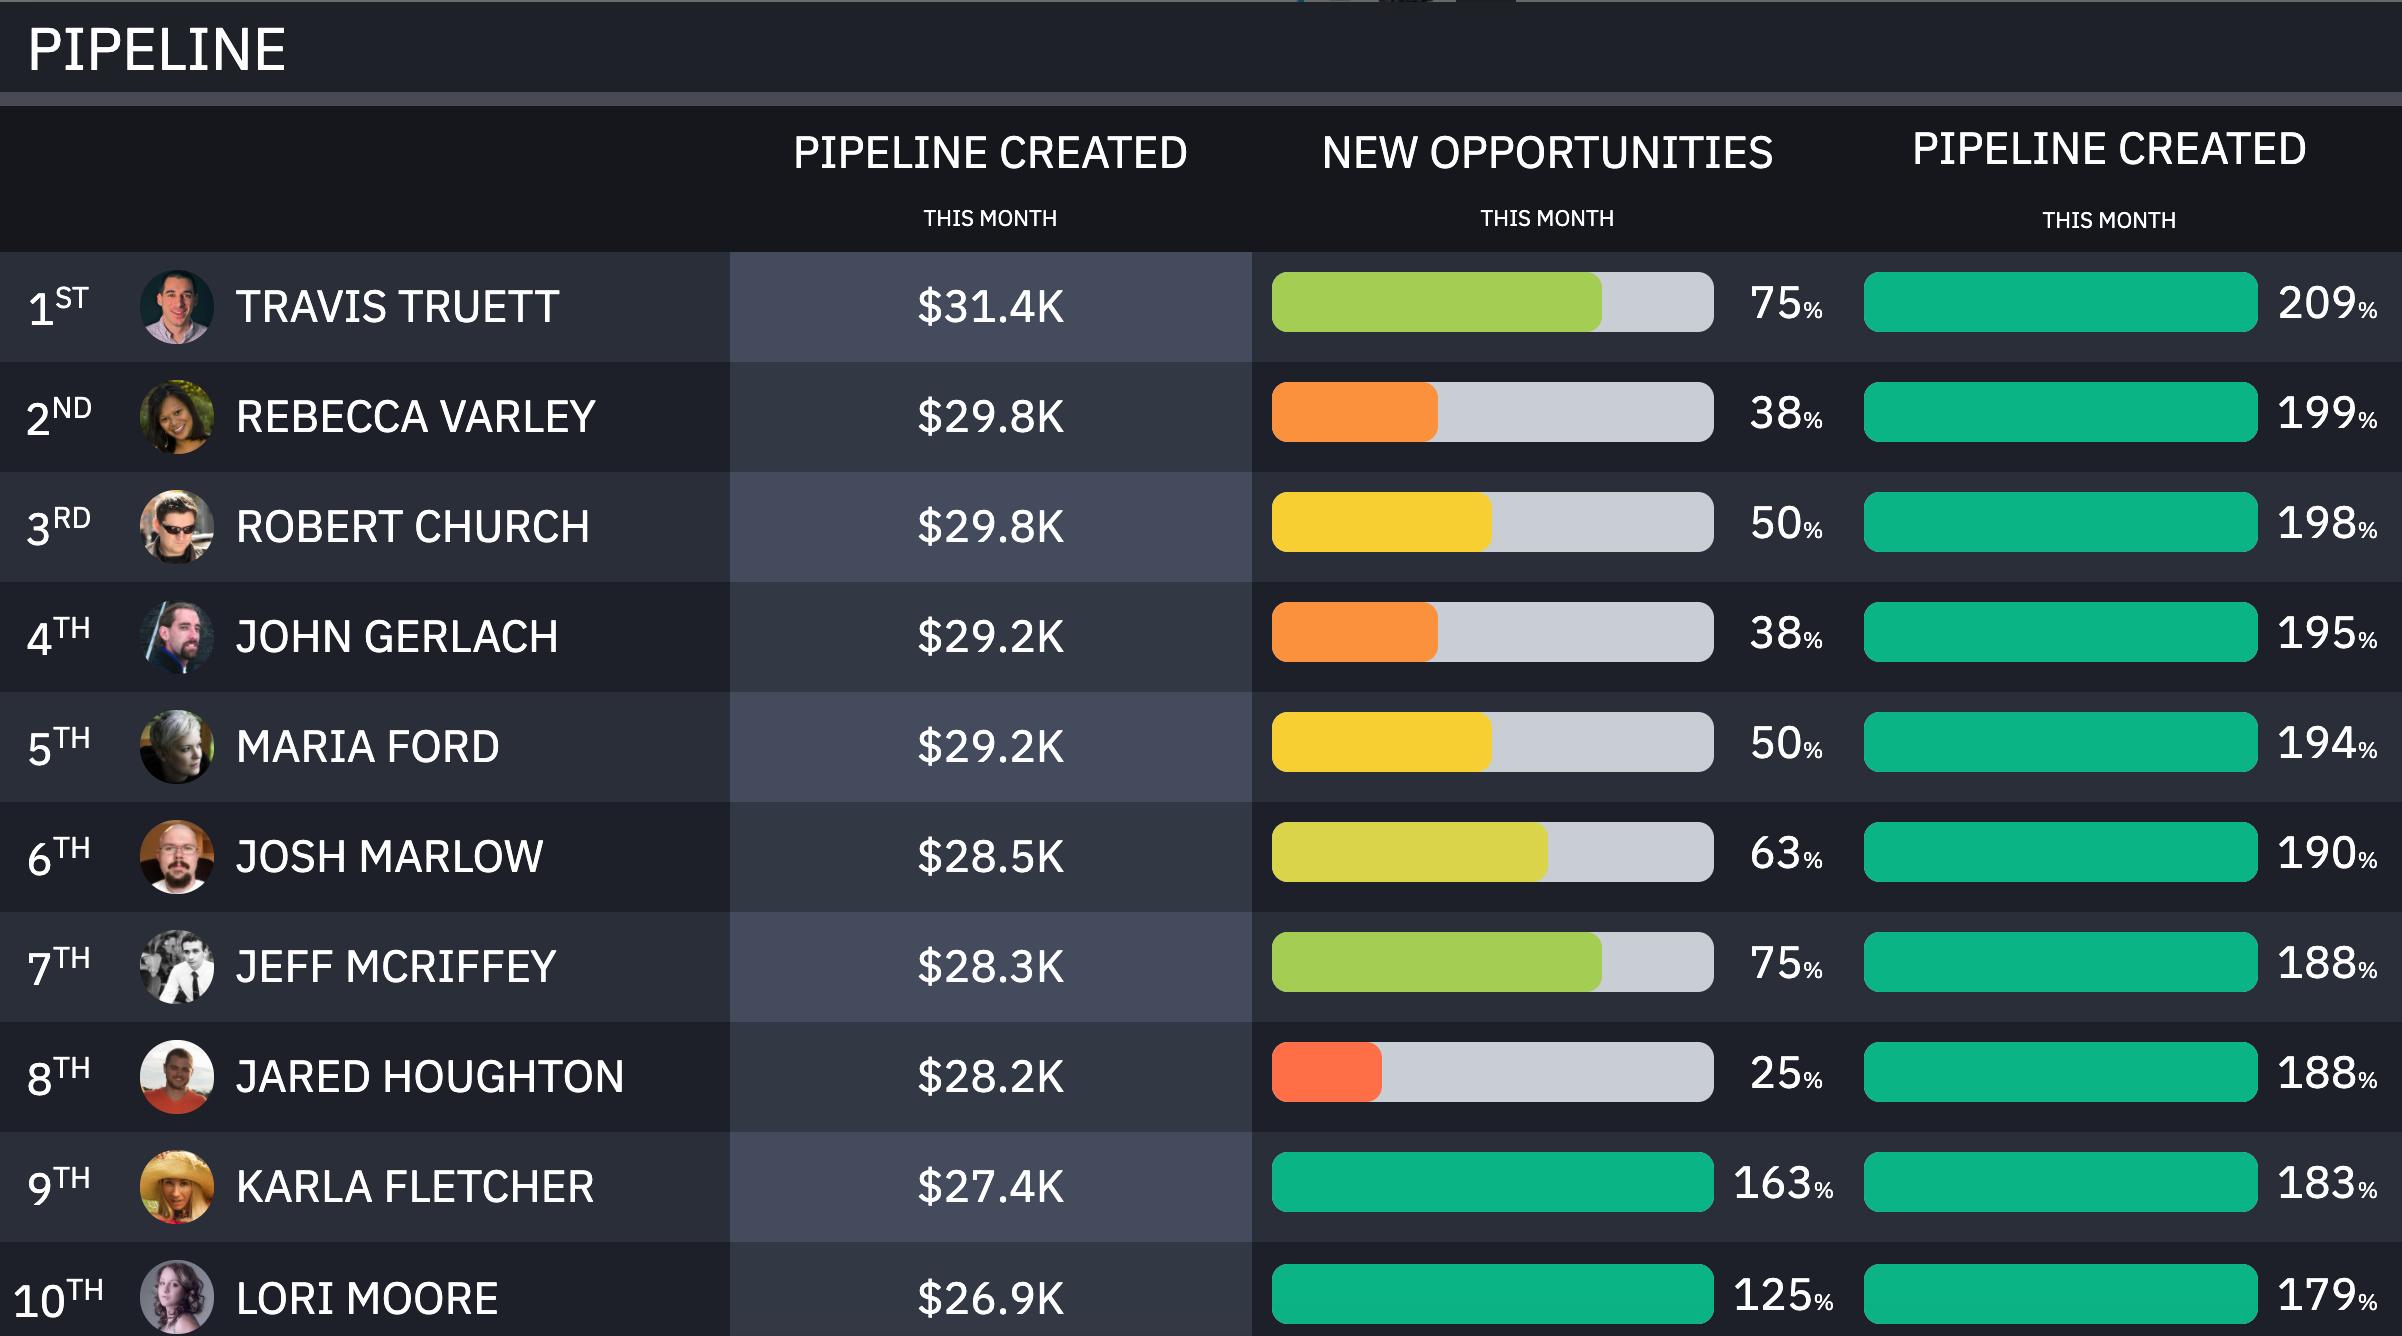 pipeline metric